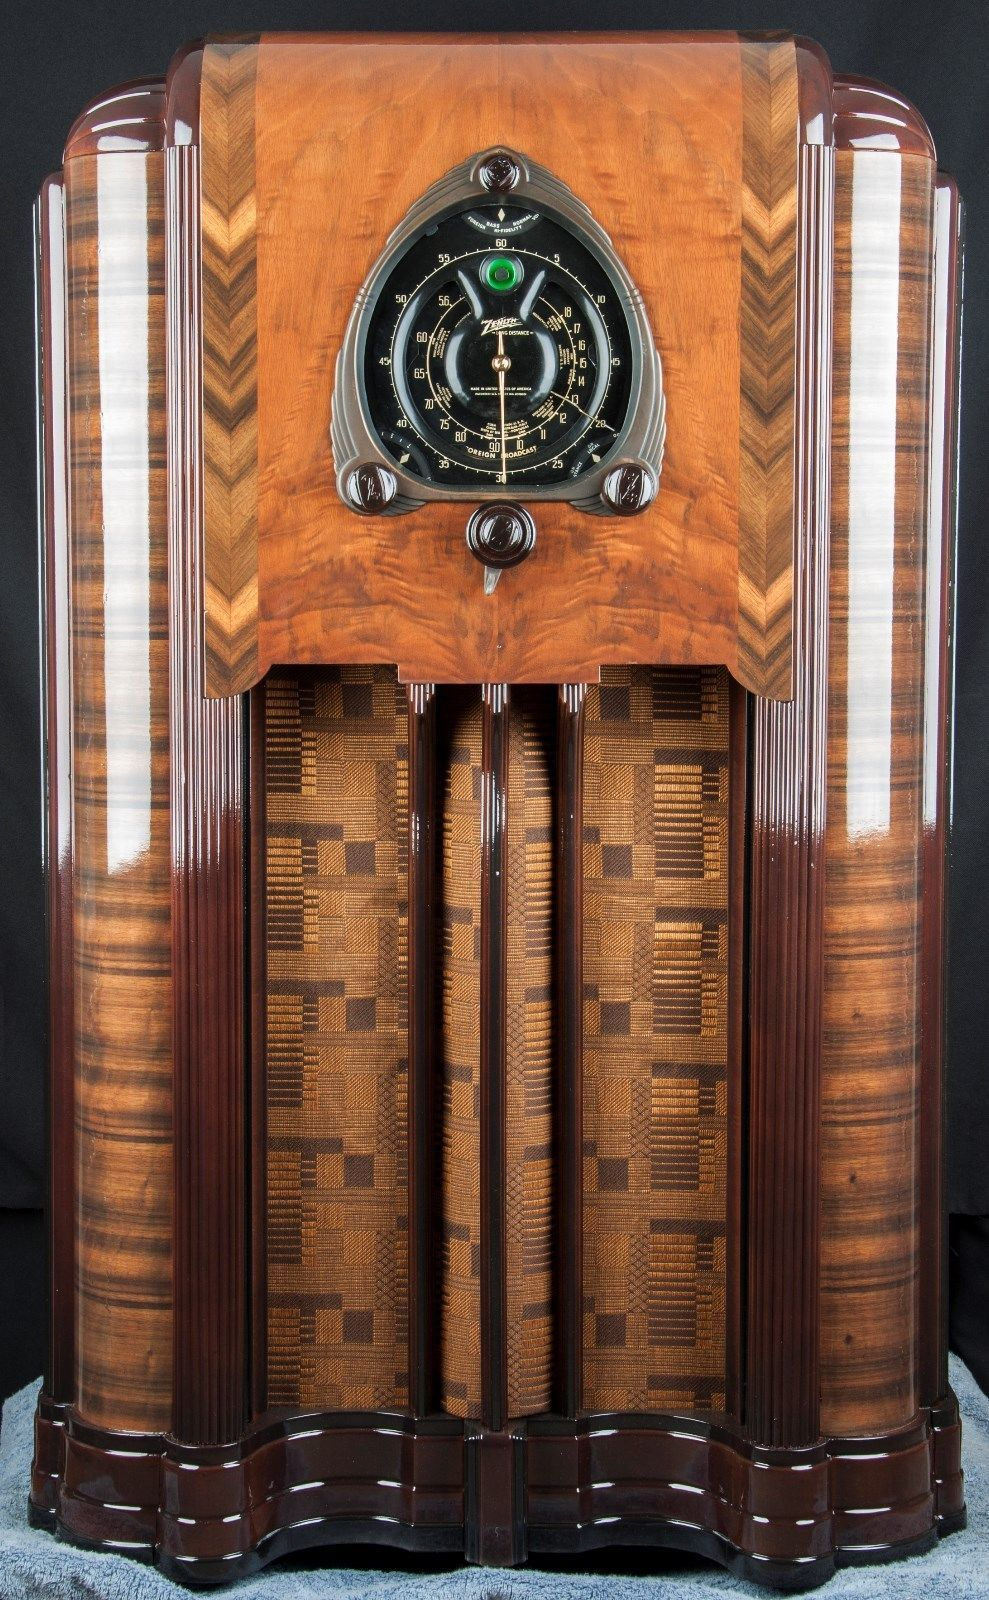 Zenith 12s267 1938 Stunning Shutter Dial Vacuum Tube Console Wood Radio Restored Ebay Retrohomedecor Vintage Radio Art Deco Furniture Art Deco Cabinet